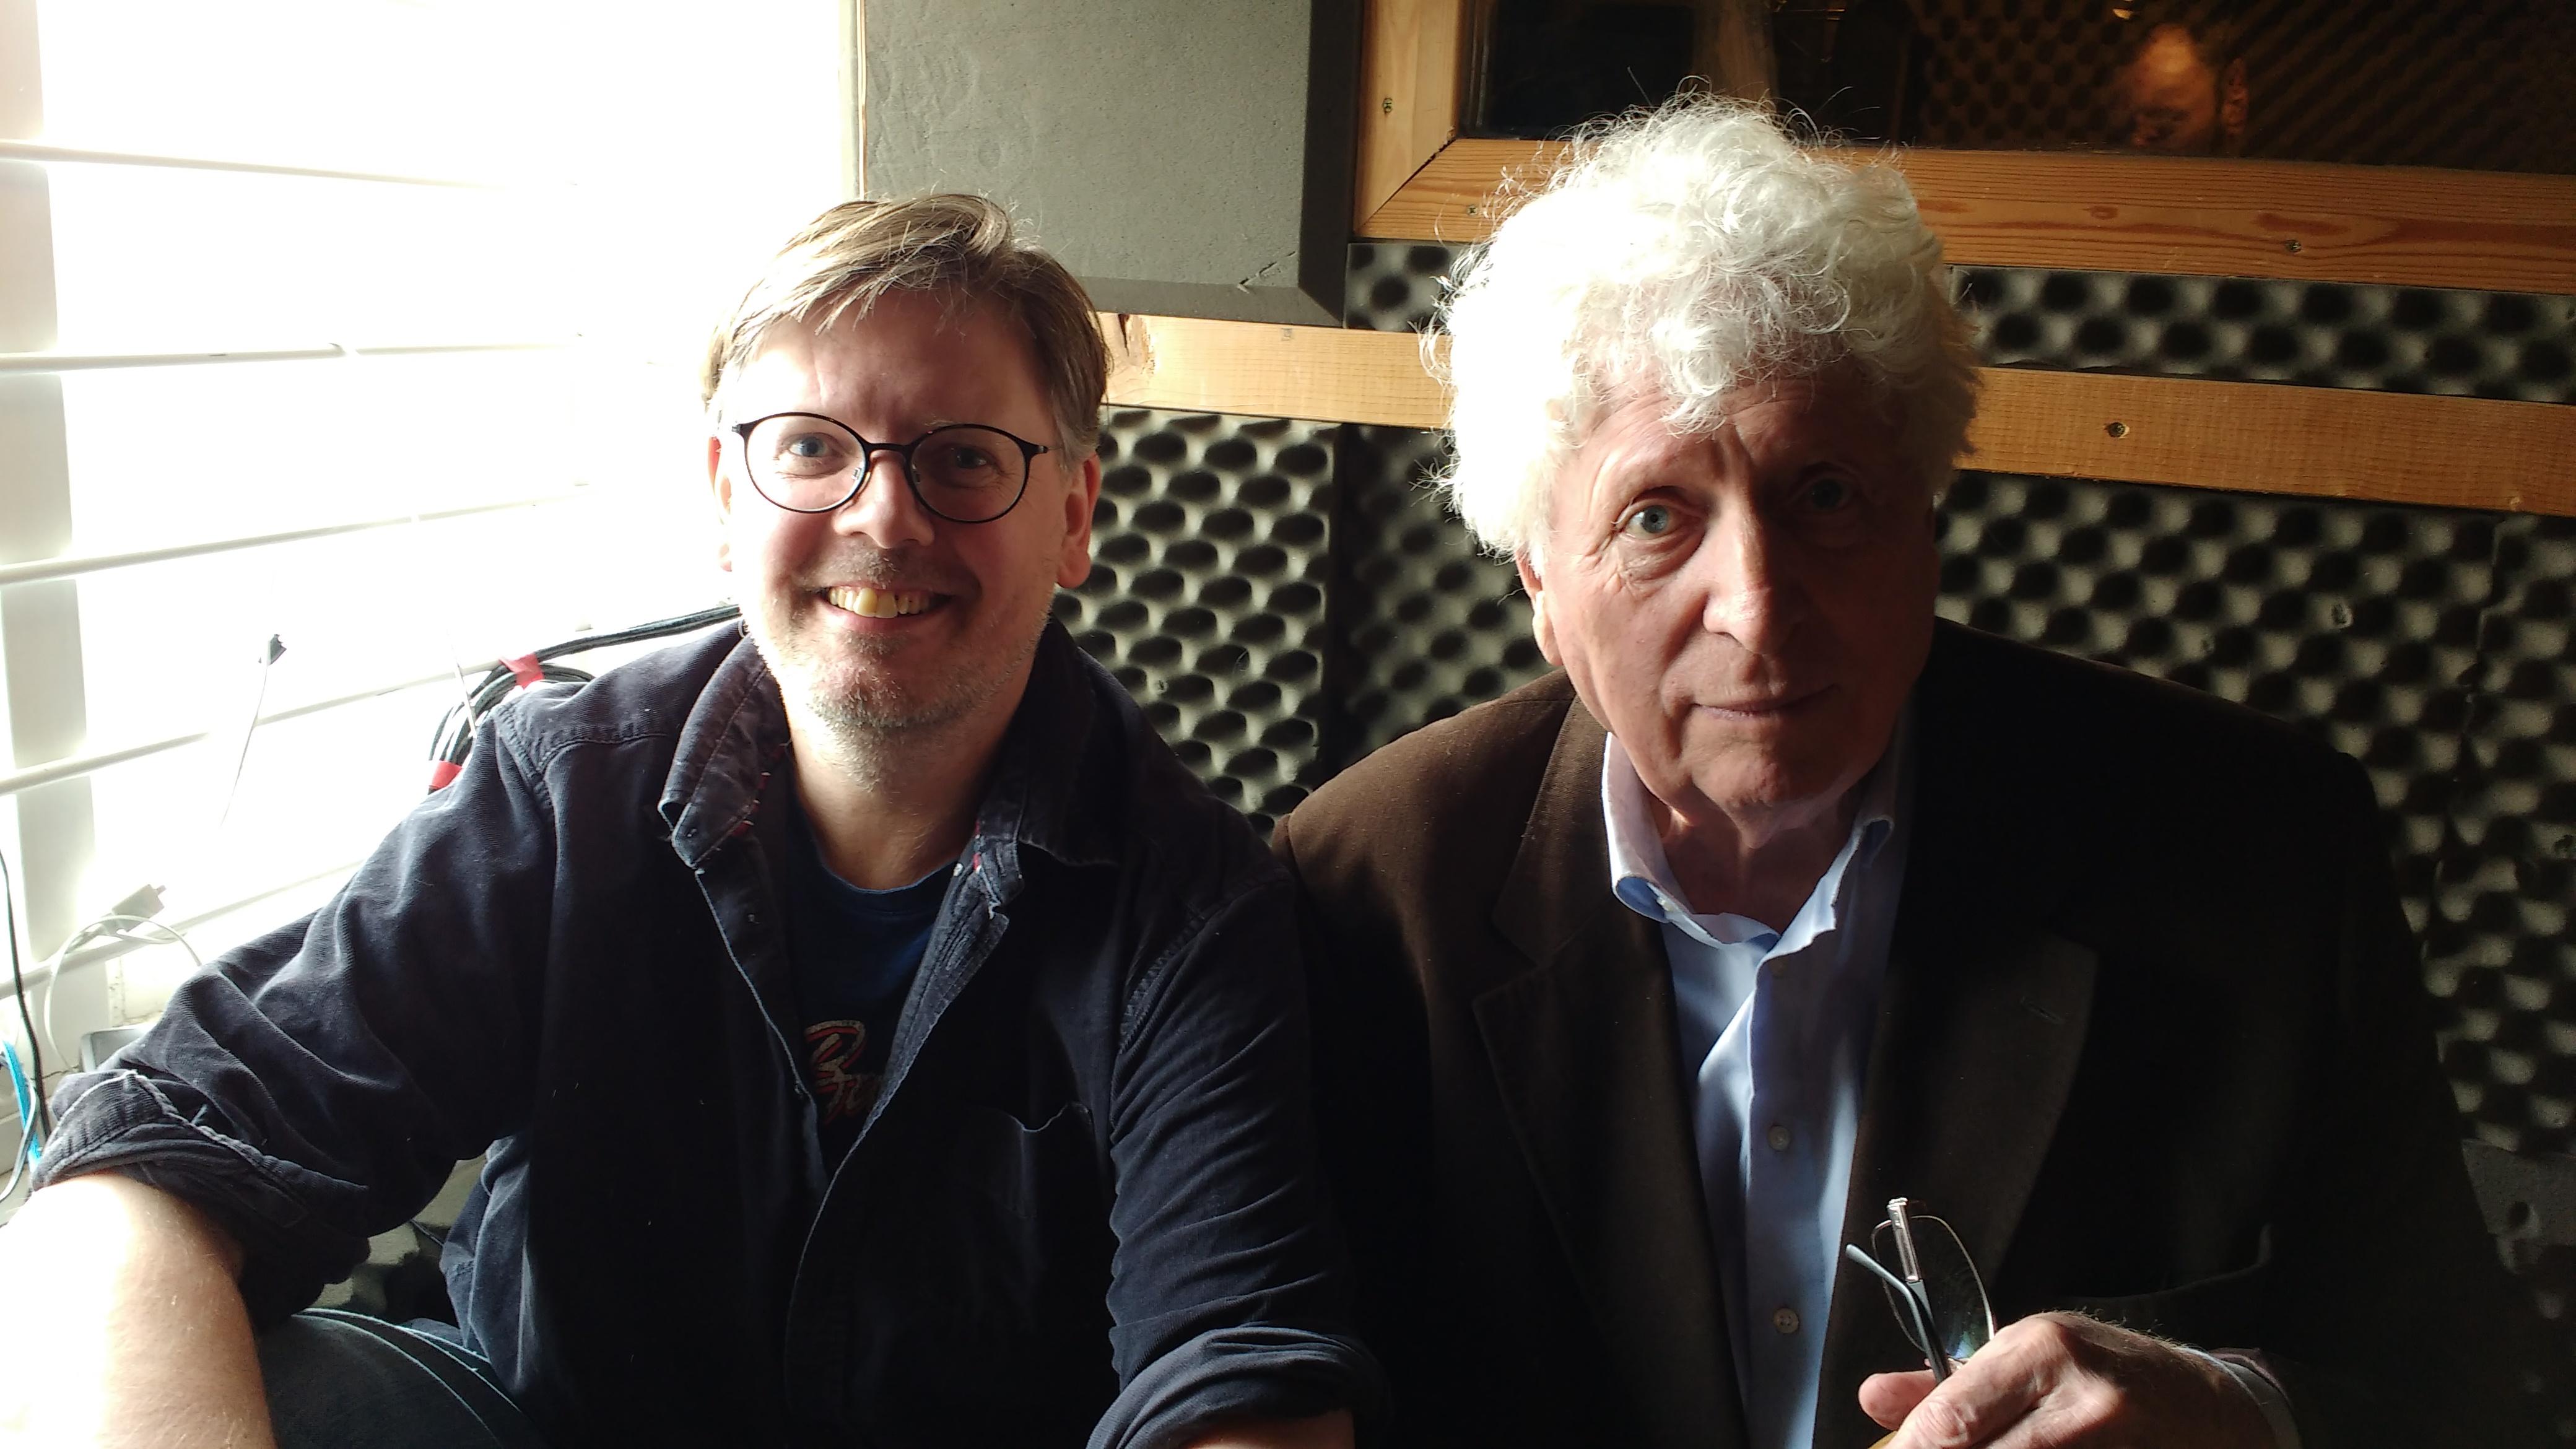 Paul Magrs and Tom Baker